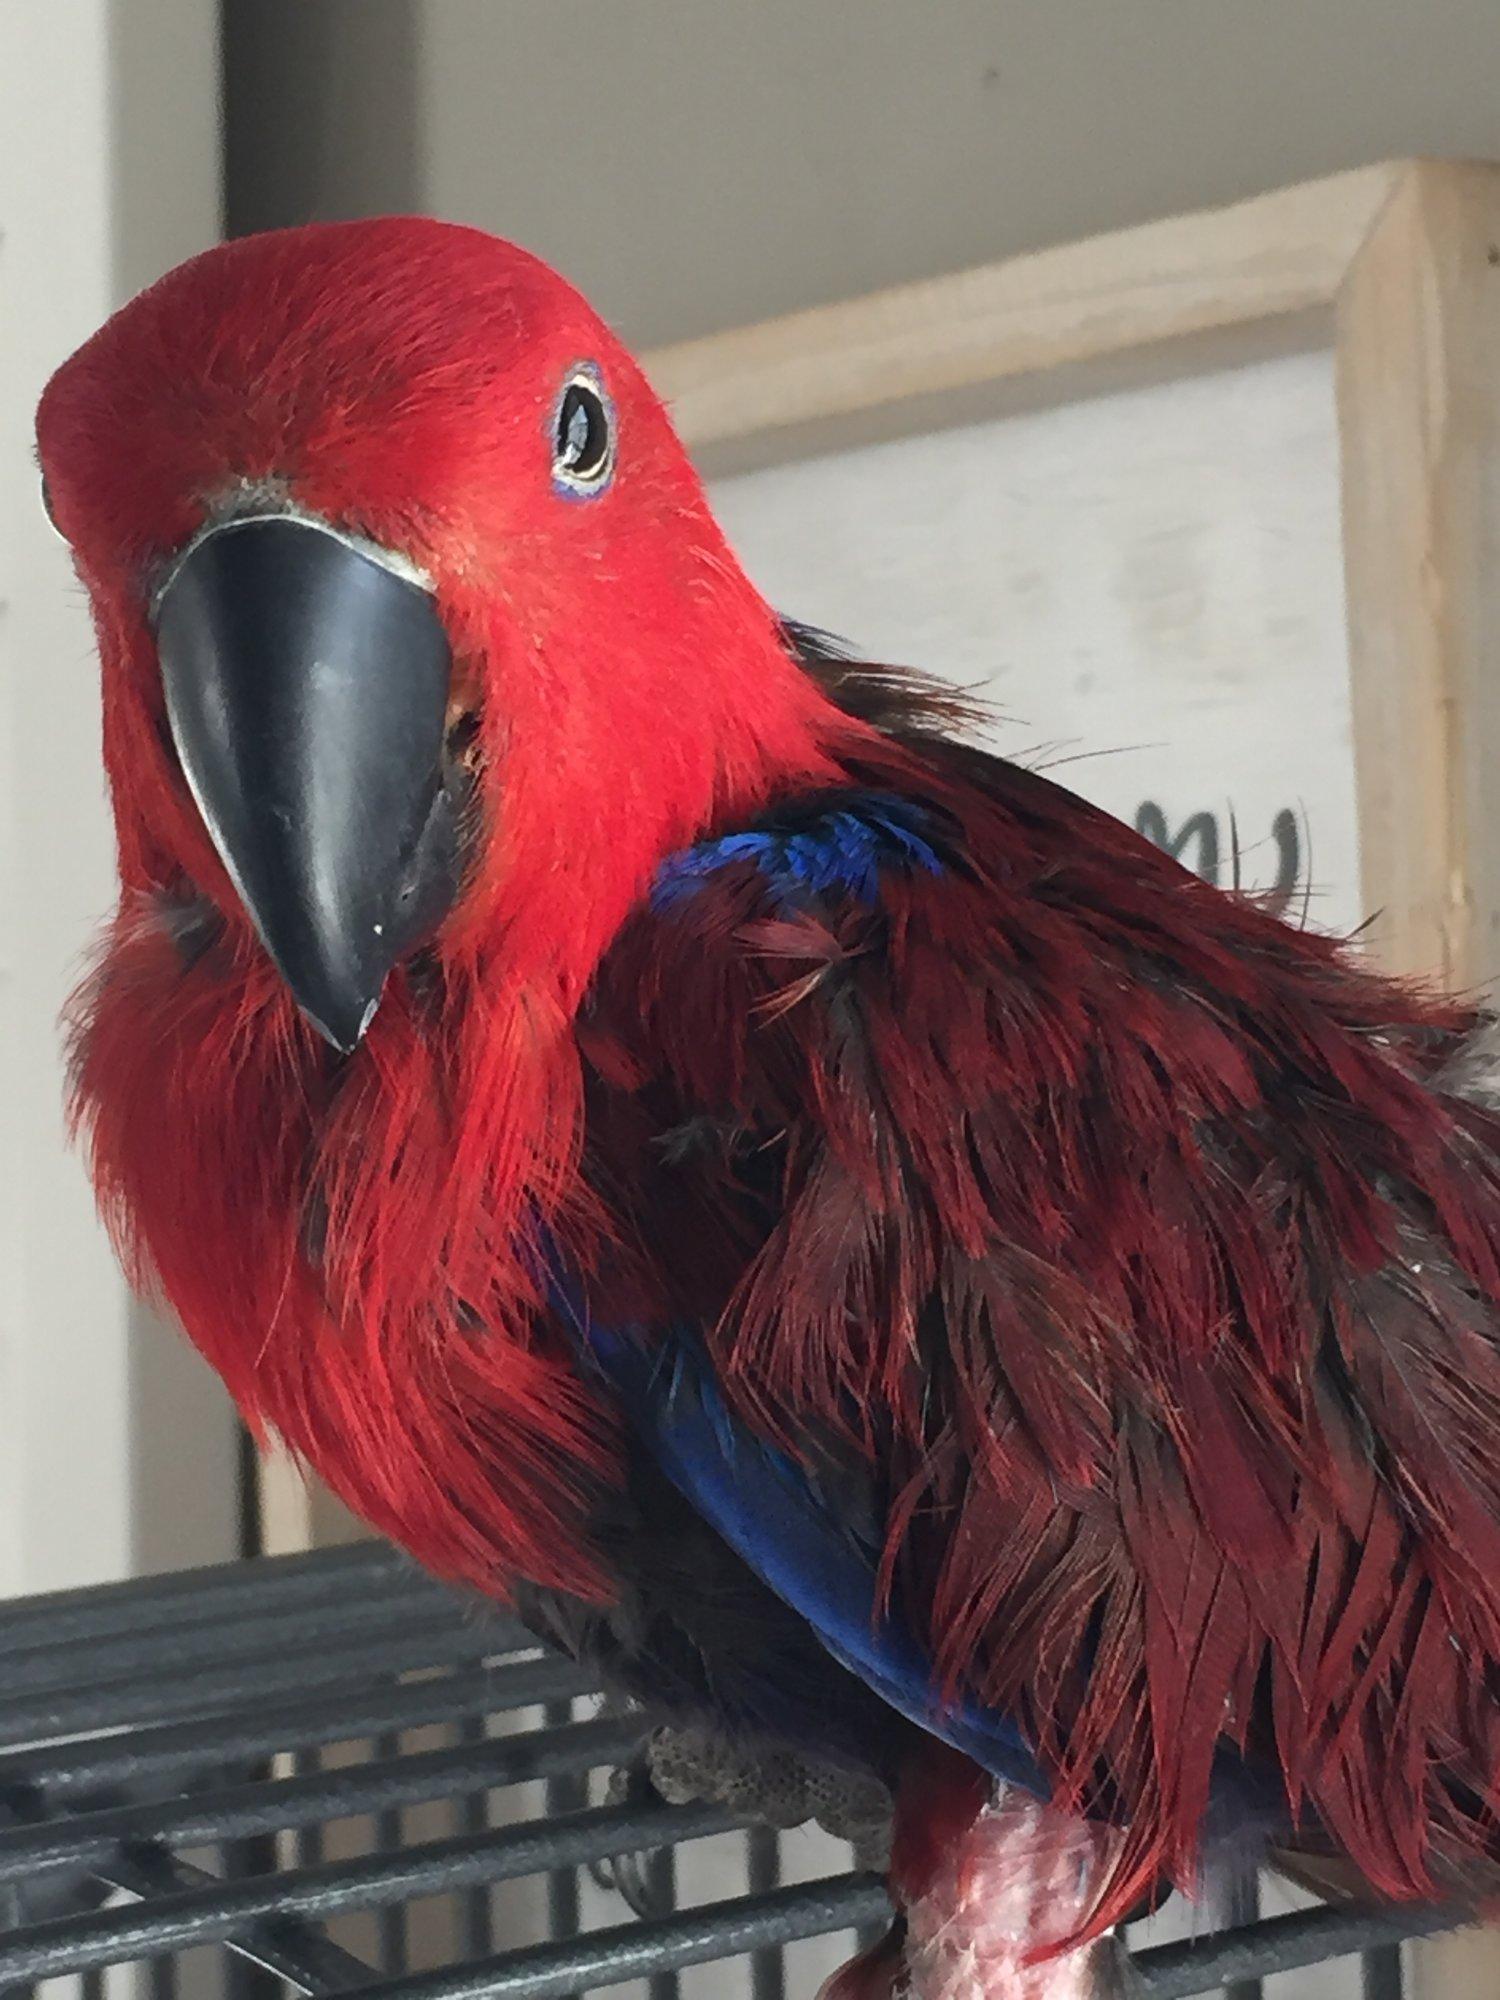 ADOPT — Connecticut Parrot Rescue